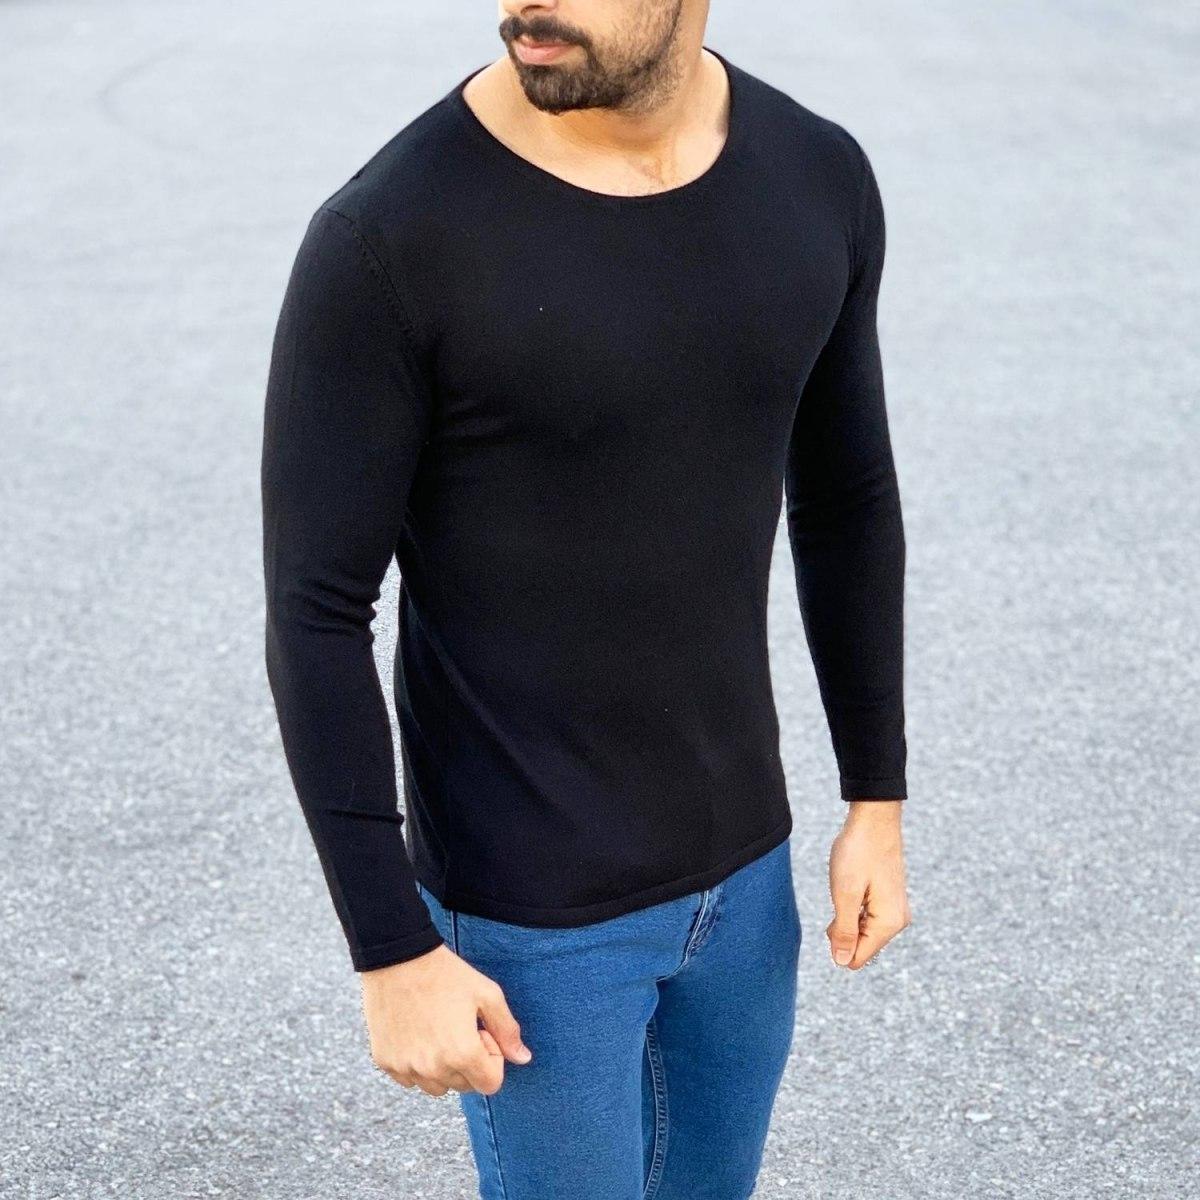 Round-Neck Slim-Fit Sweater in Black